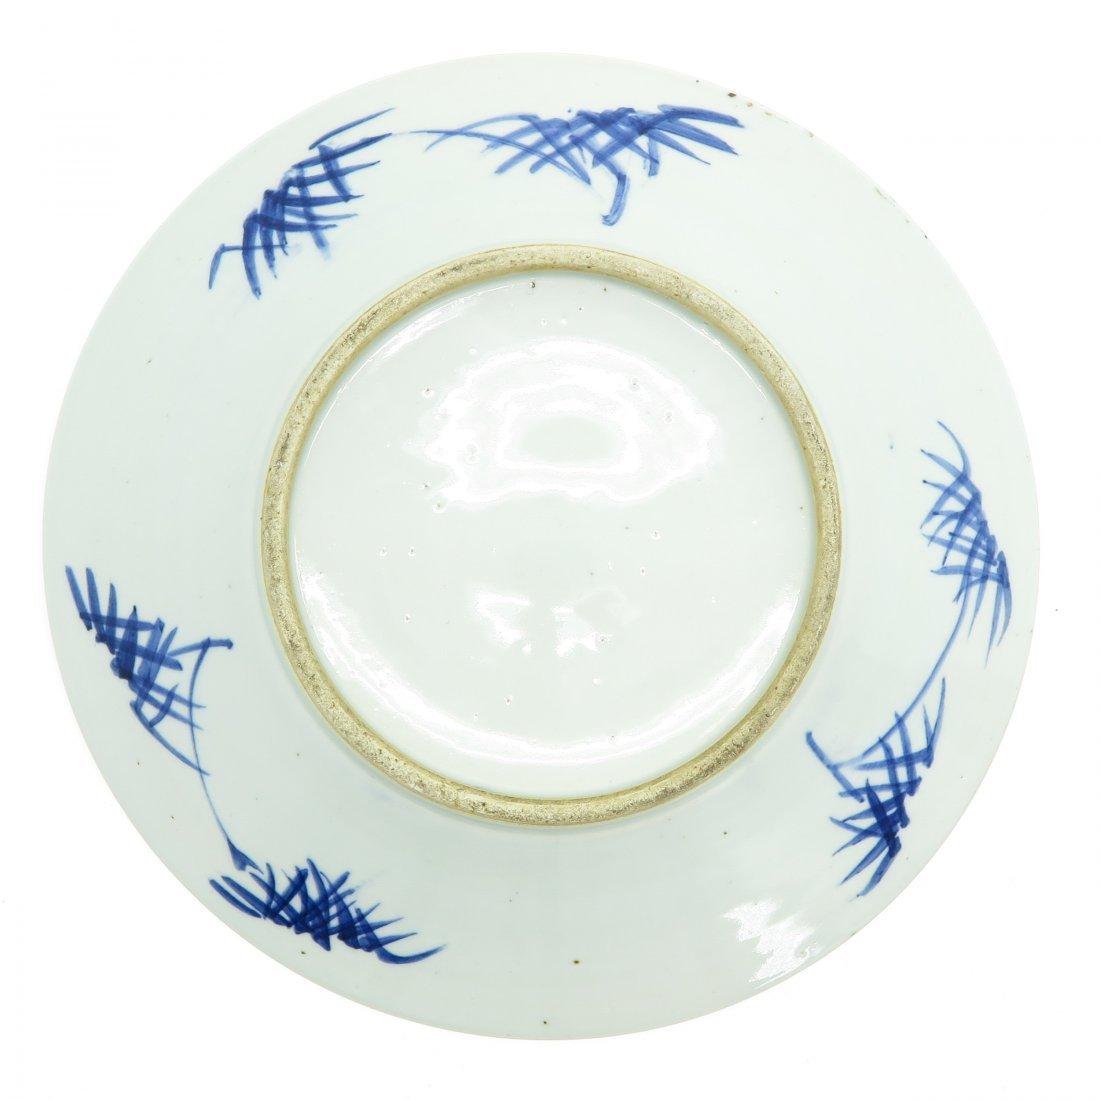 China Porcelain Plate Circa 1900 - 2